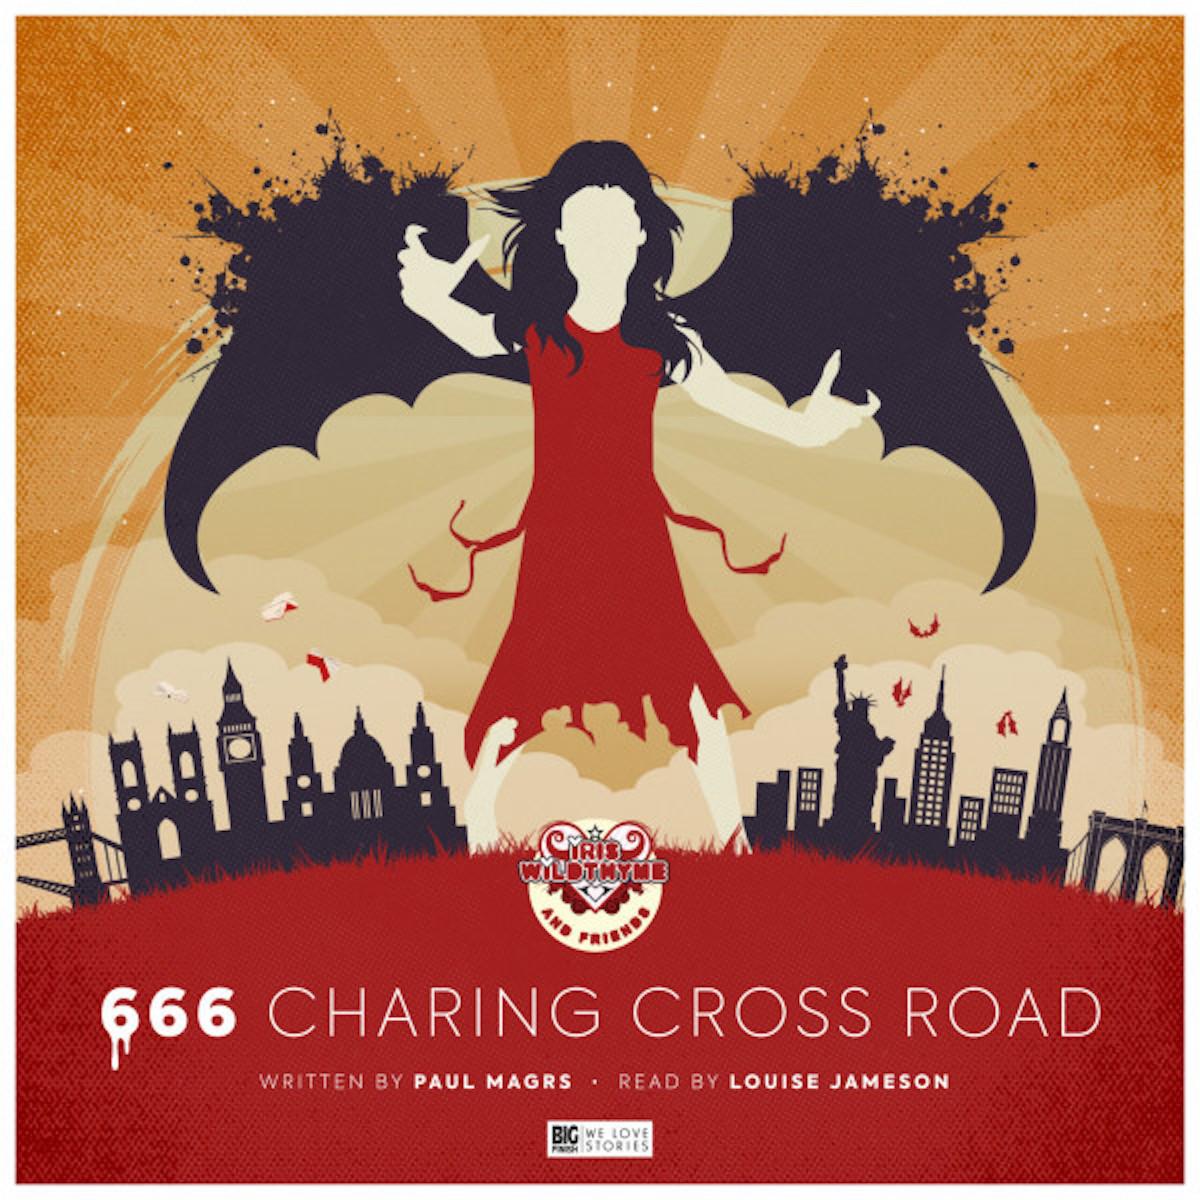 666 Charing Cross Road